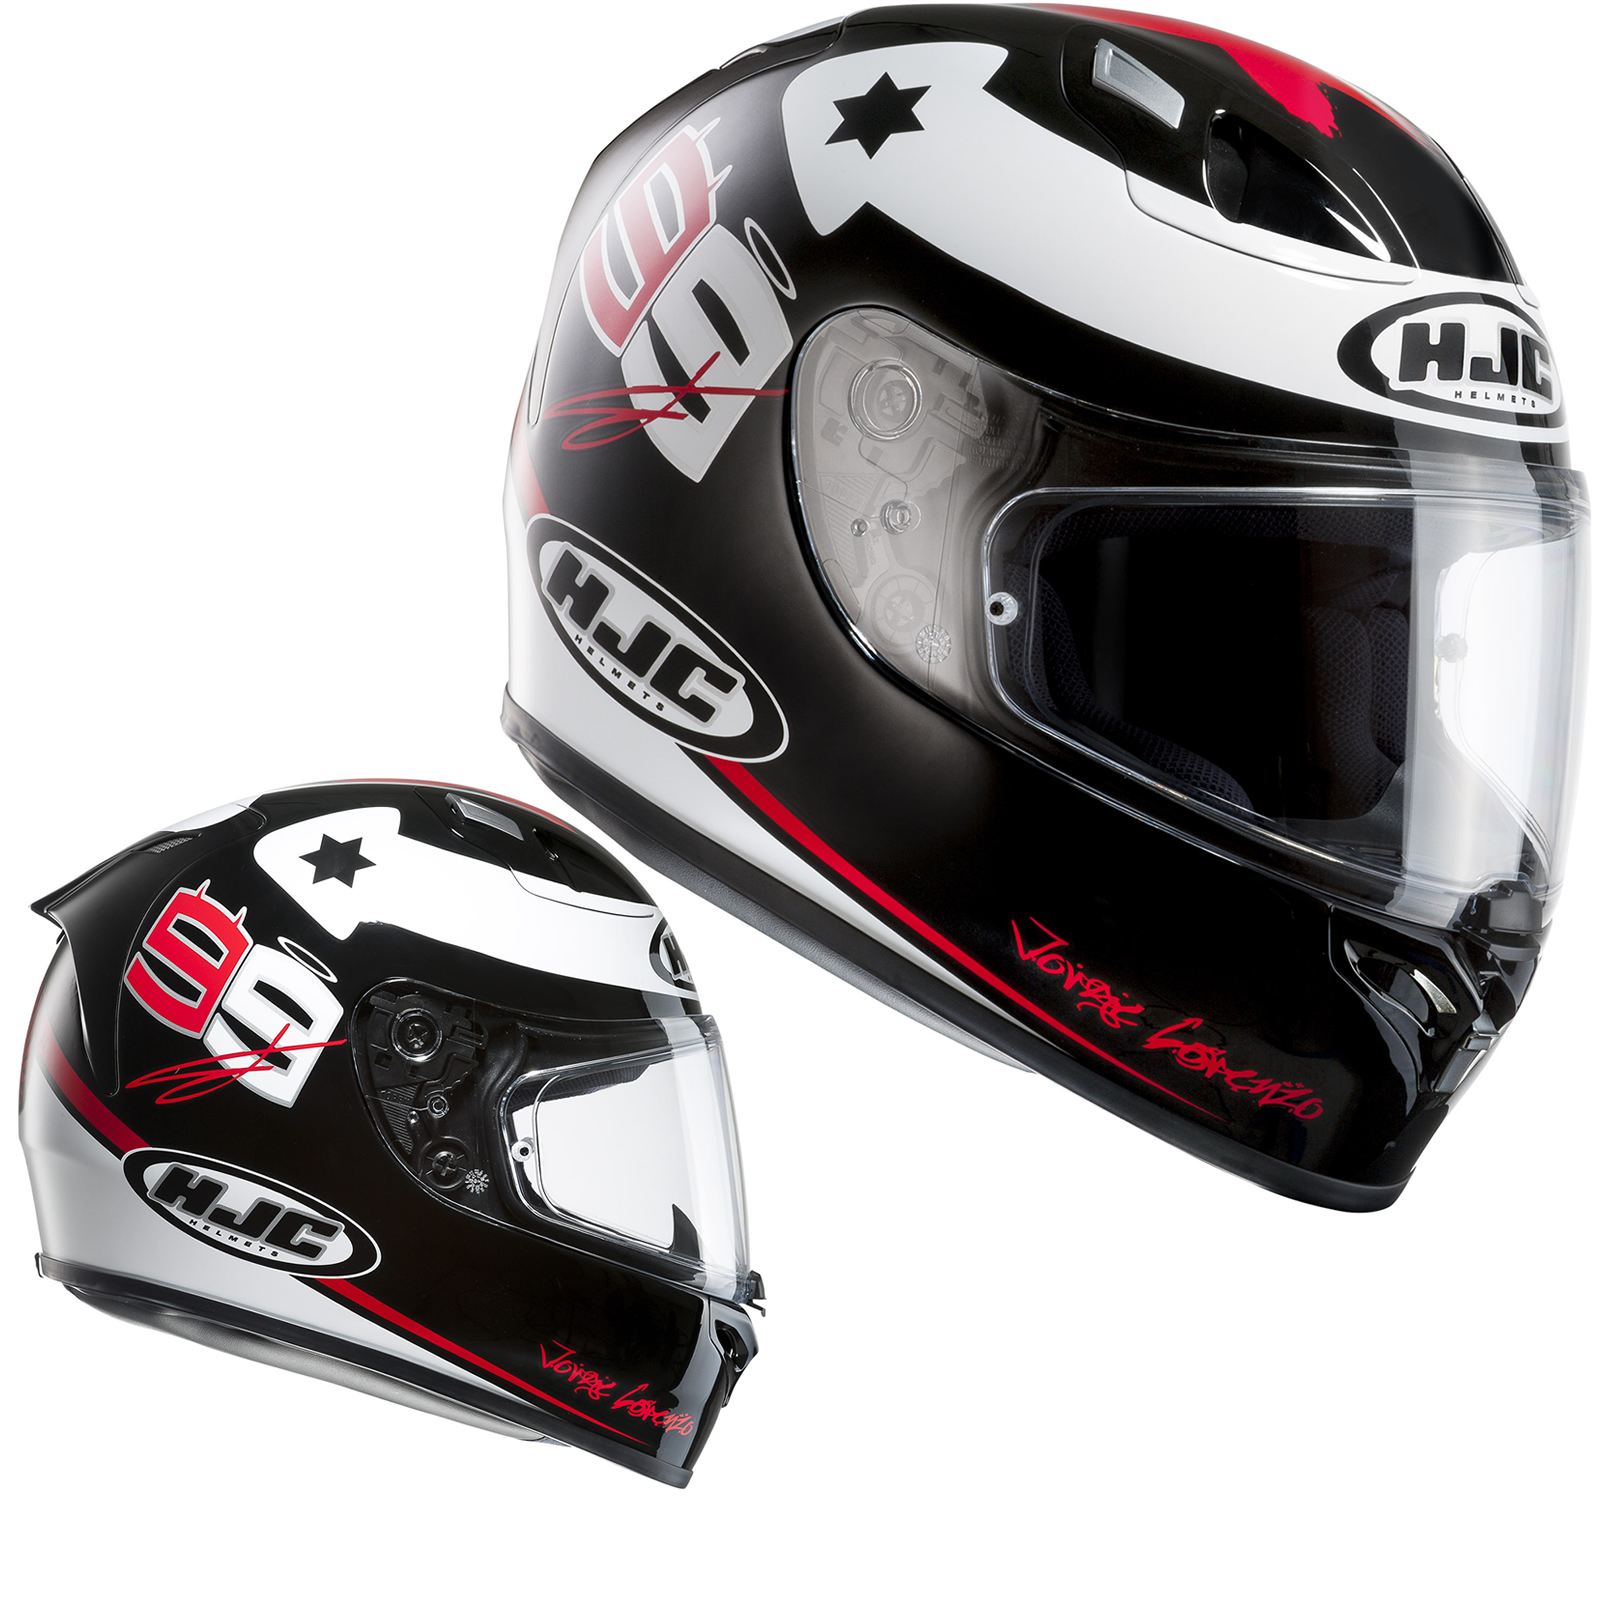 Hjc Fg 17 >> HJC FG-17 X-Fuera Lorenzo Motorcycle Helmet - Full Face Helmets - Ghostbikes.com